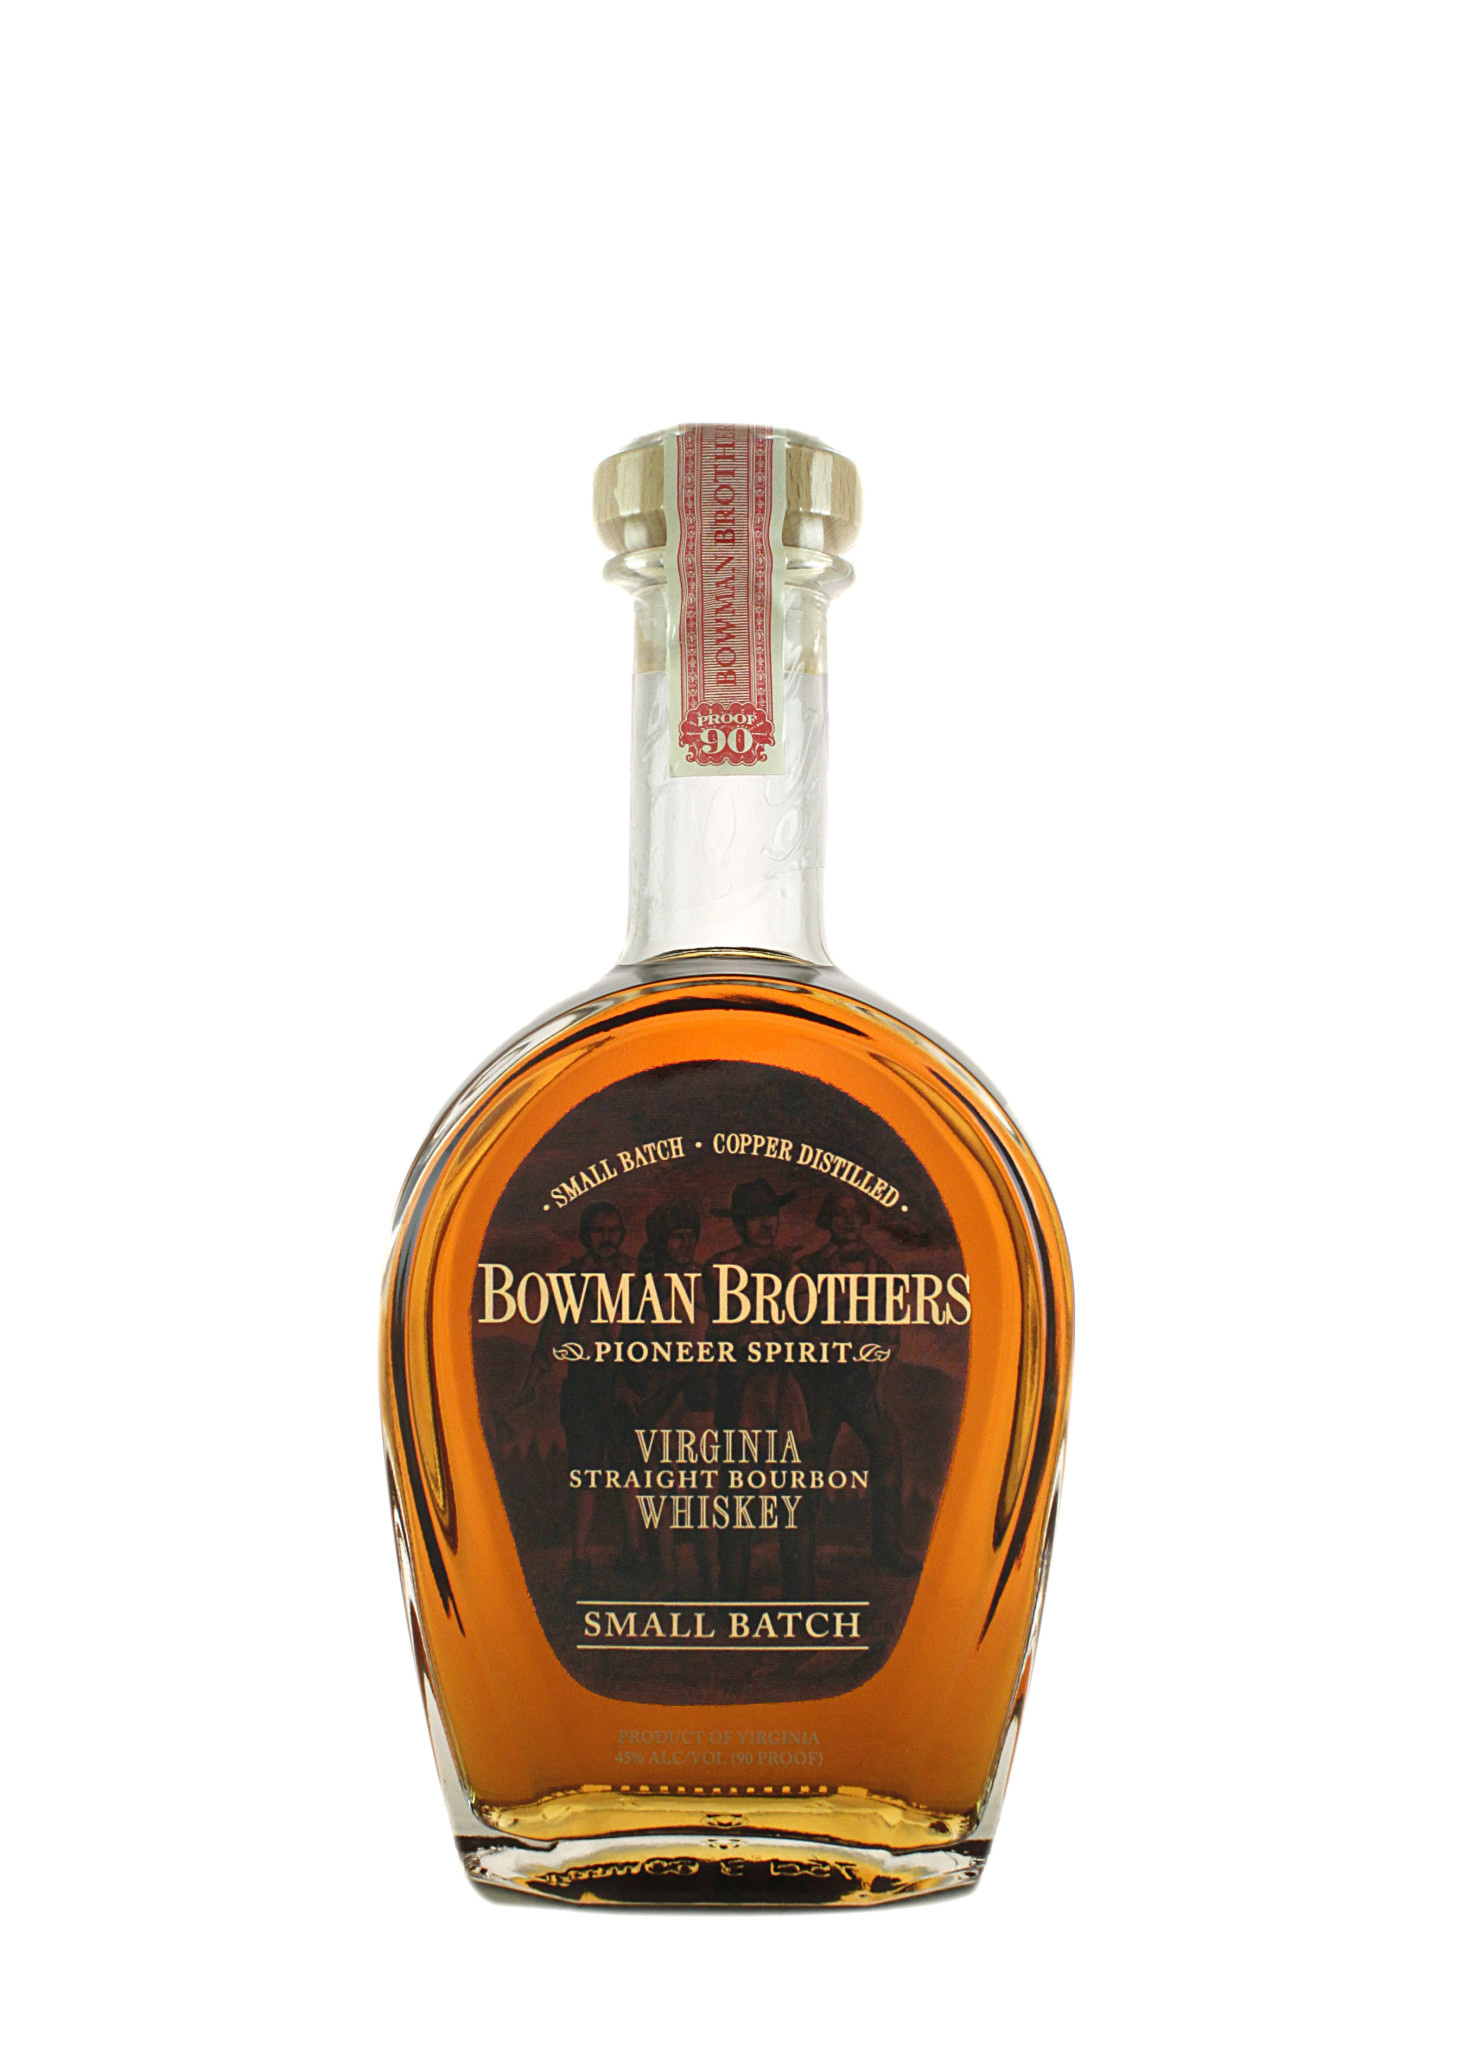 Bowman Brothers Small Batch Virginia Straight Bourbon, Virginia